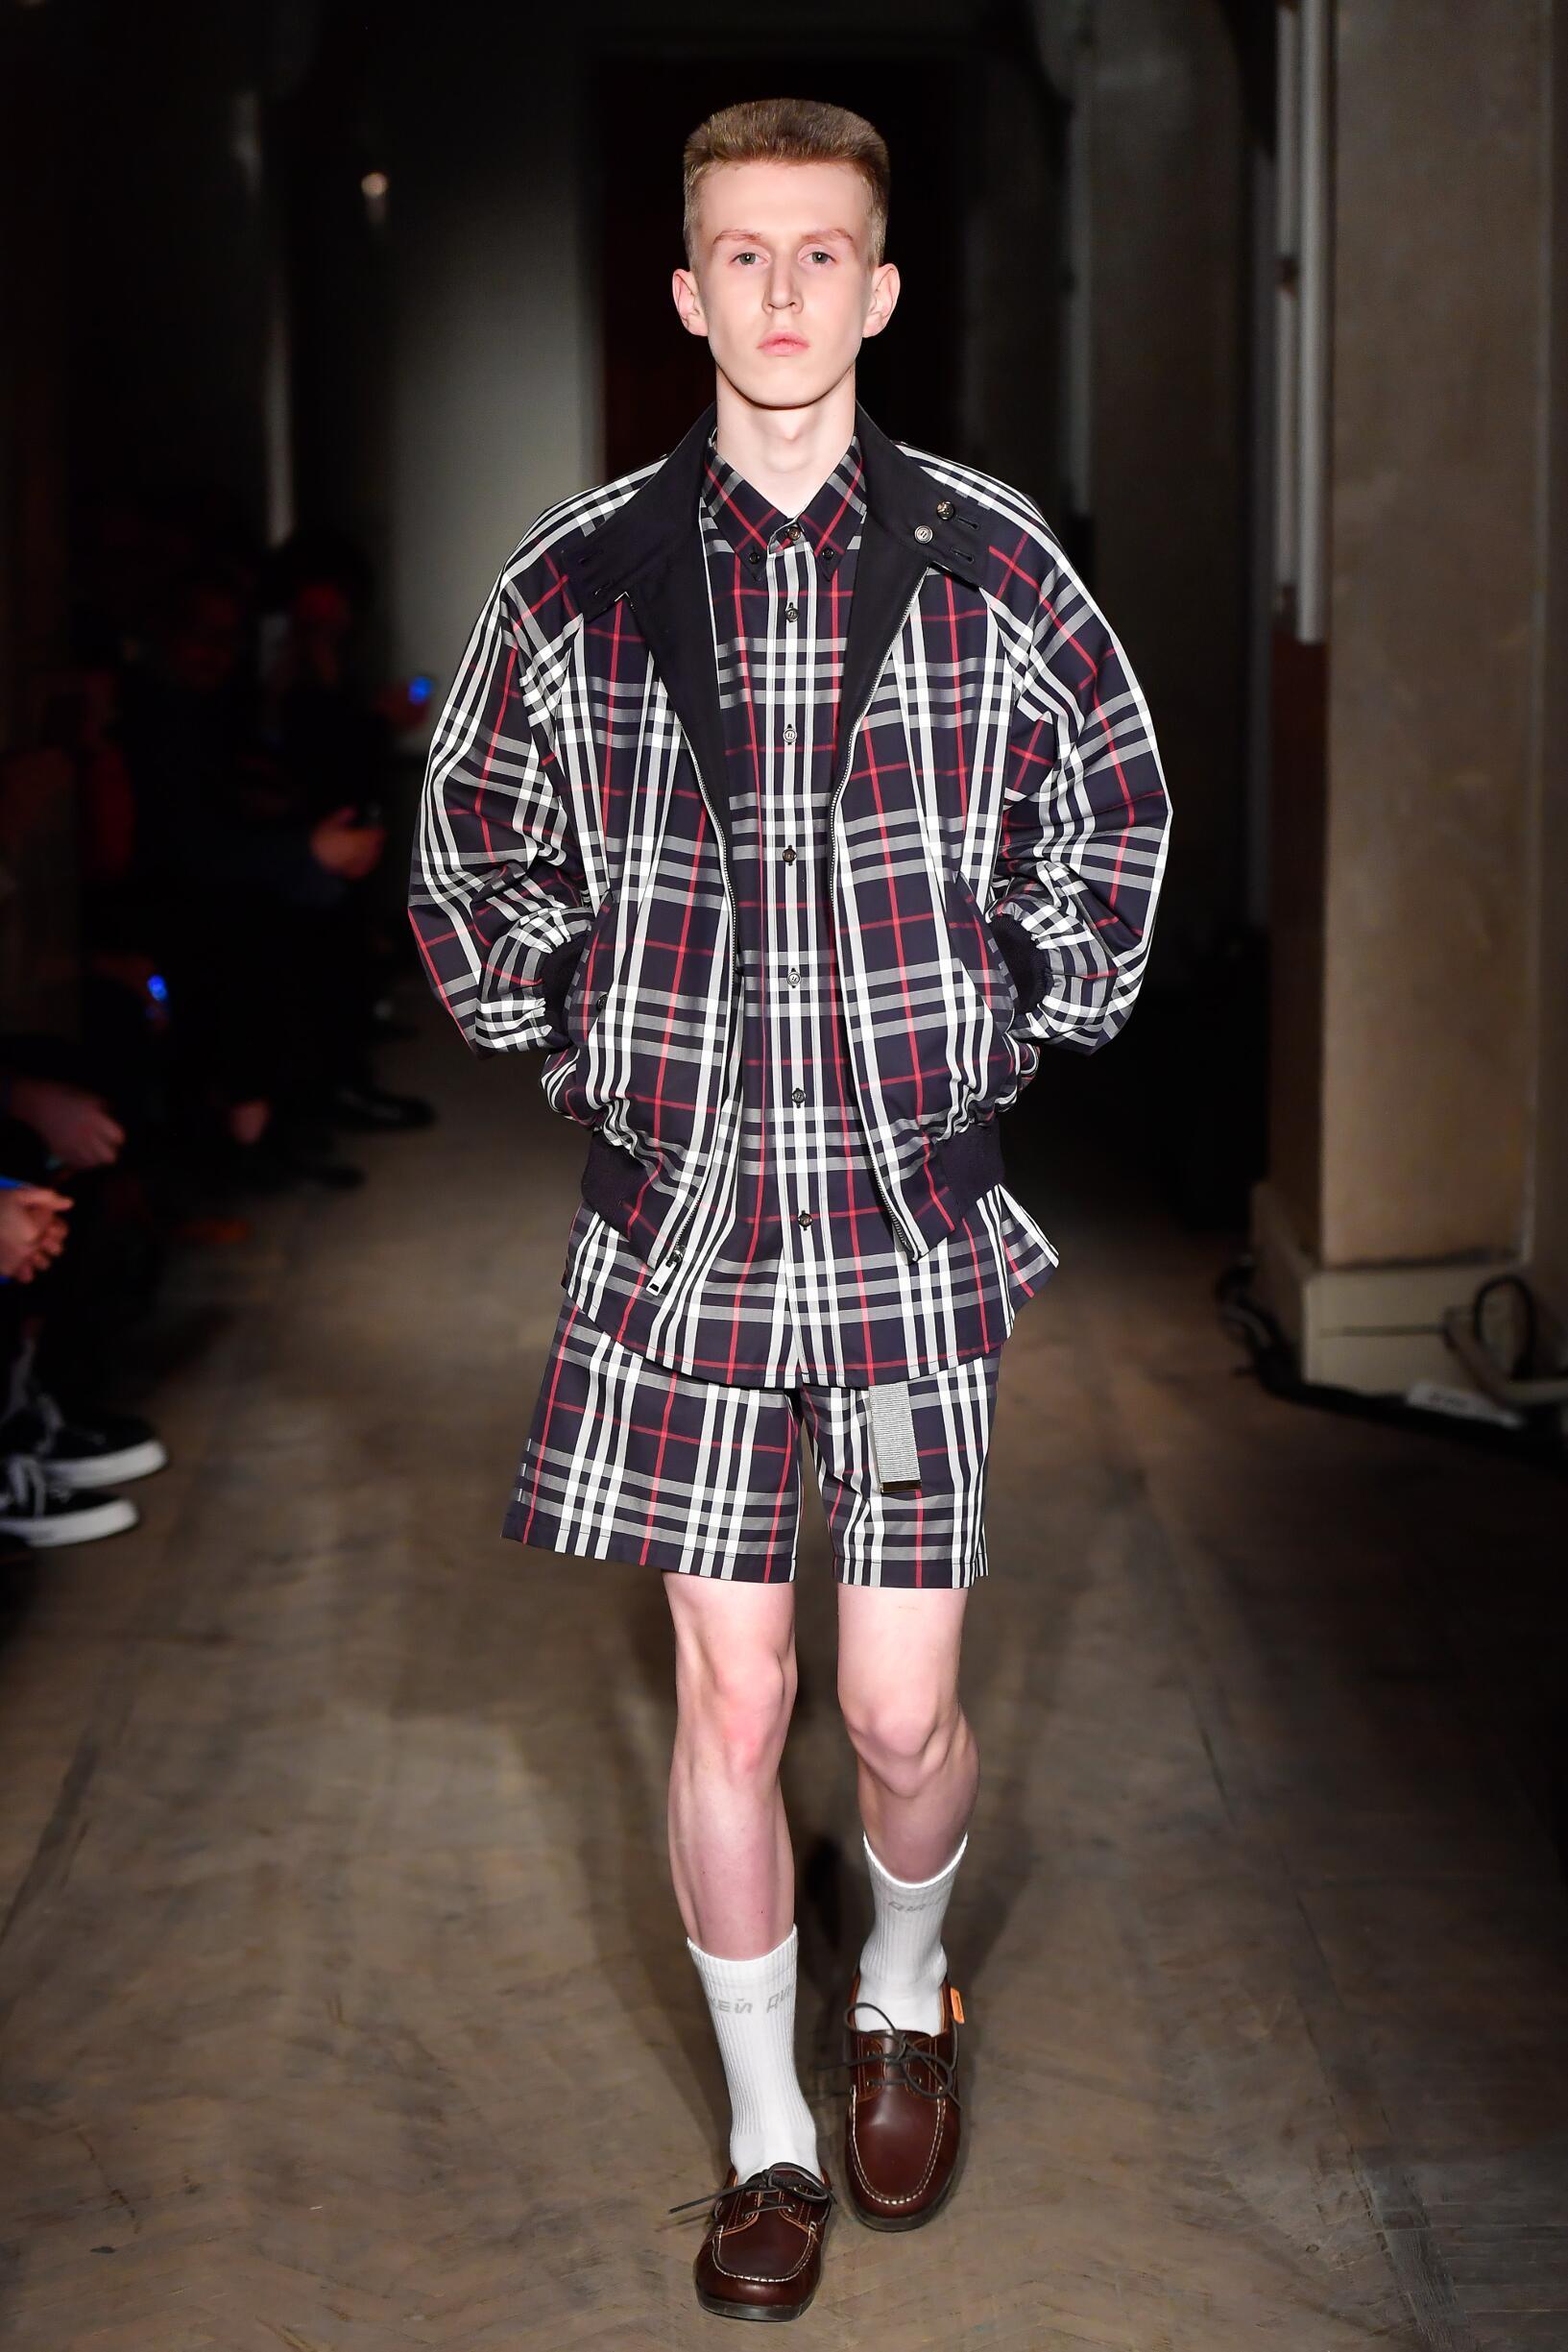 Gosha Rubchinskiy Man Fashion Style